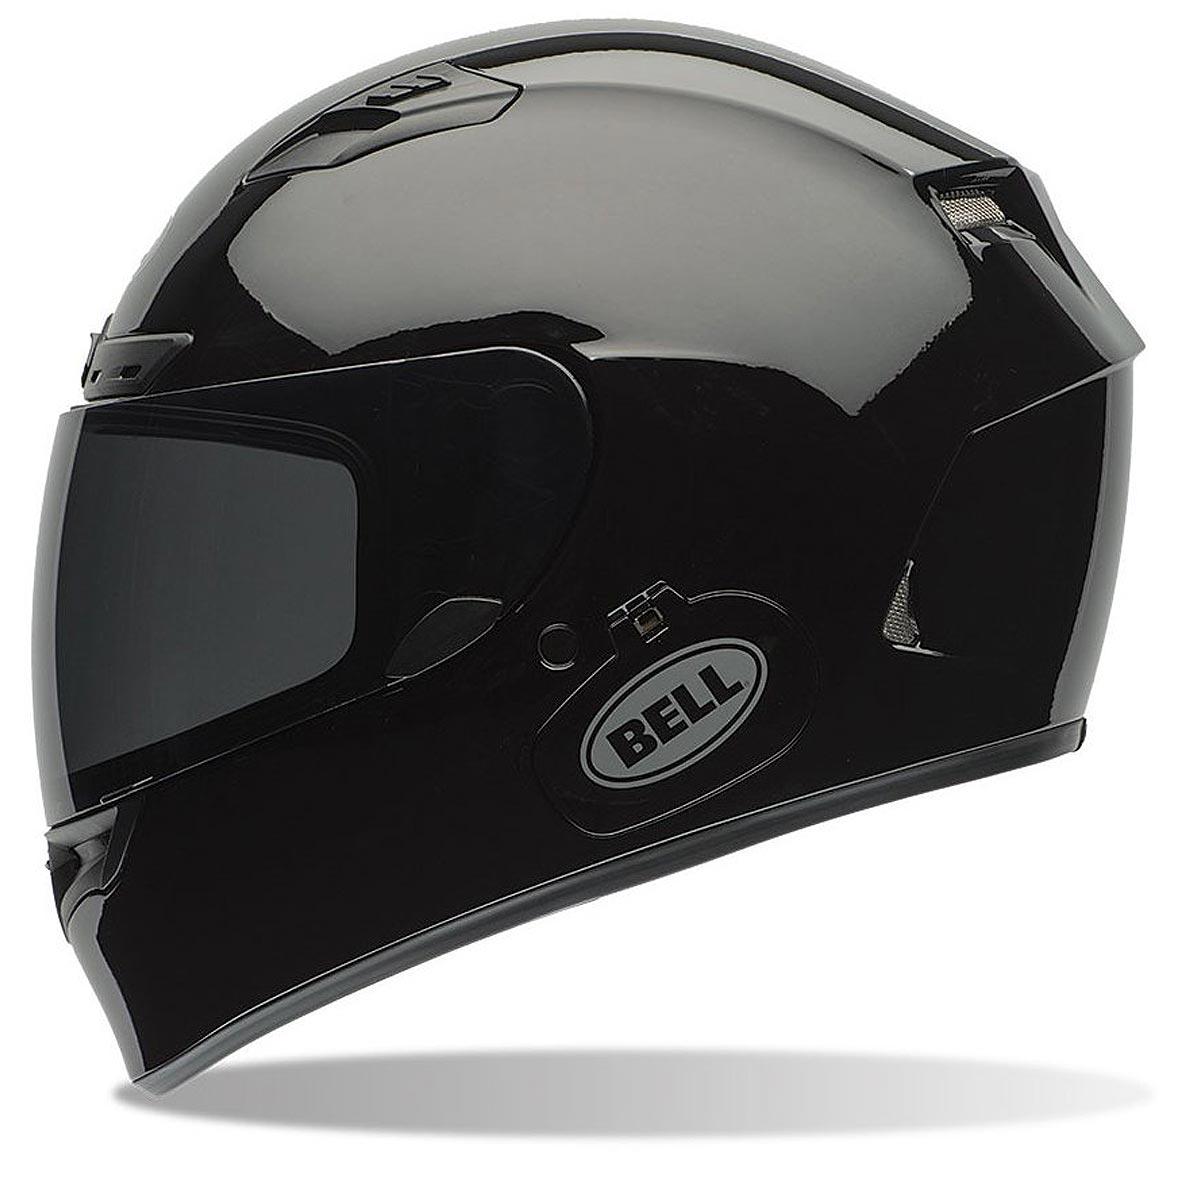 Bell Helmets Bell Qualifier DLX Black Full Face Helmet